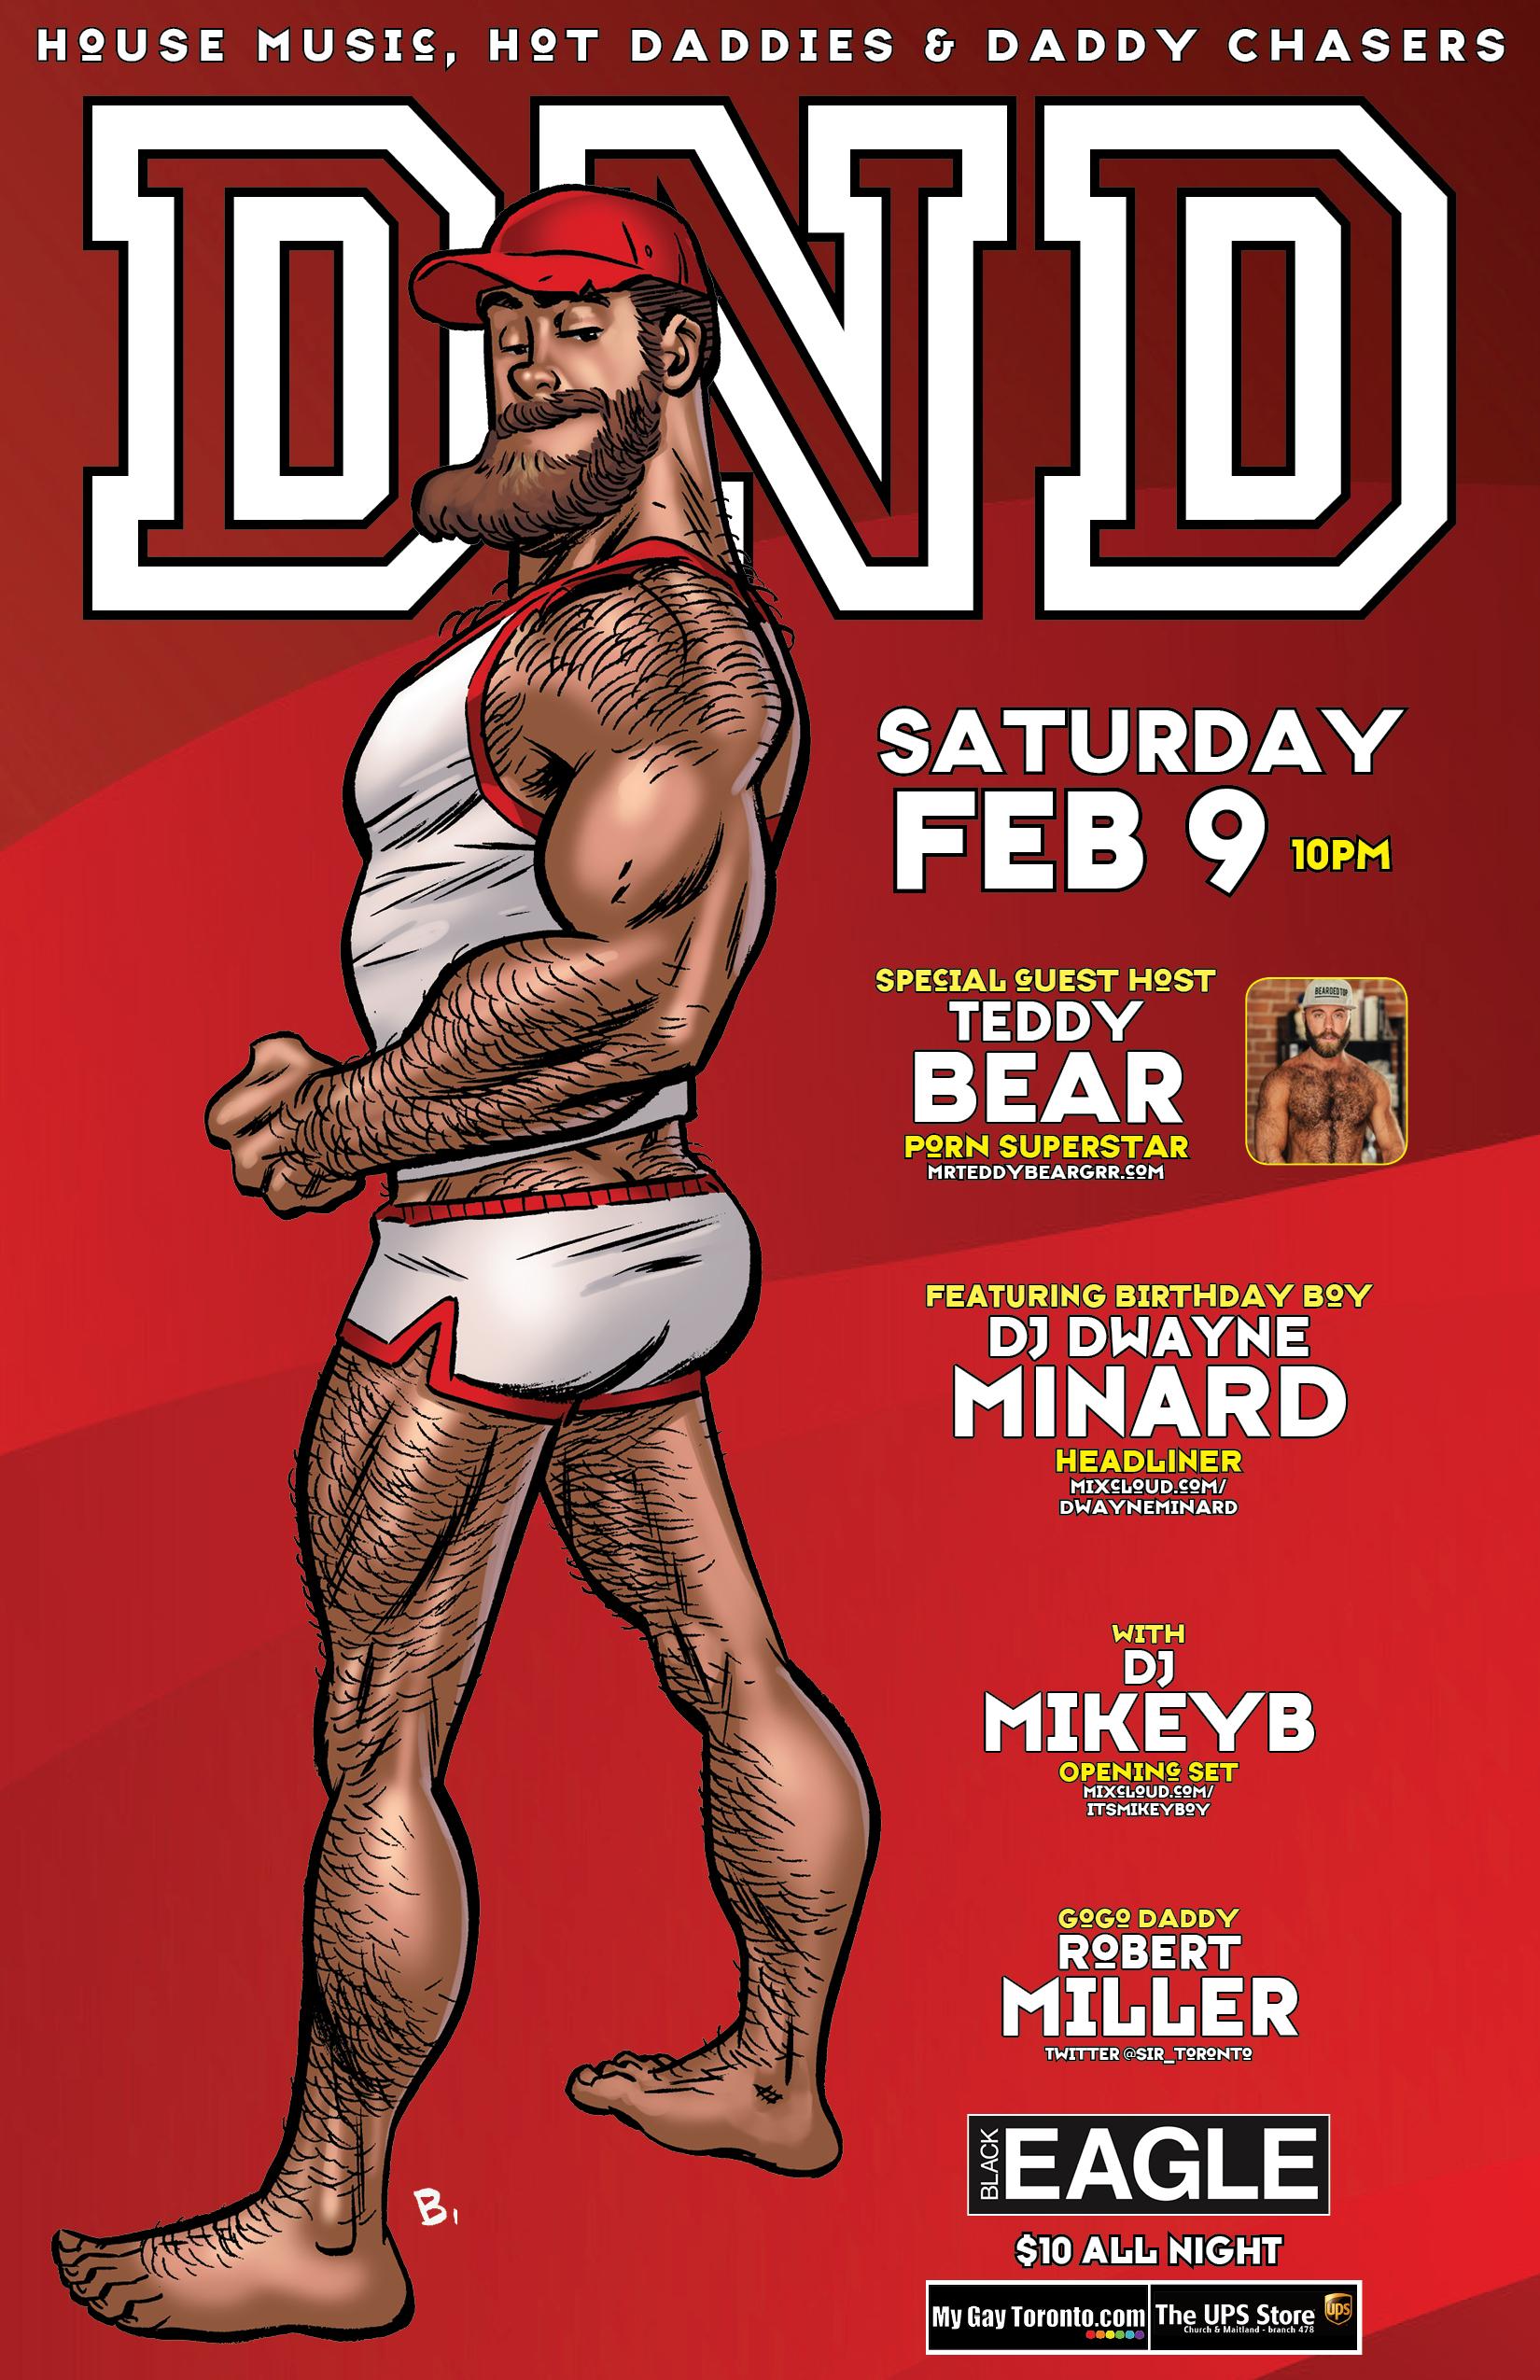 DND_TeddyBear_Feb9_Poster.jpg